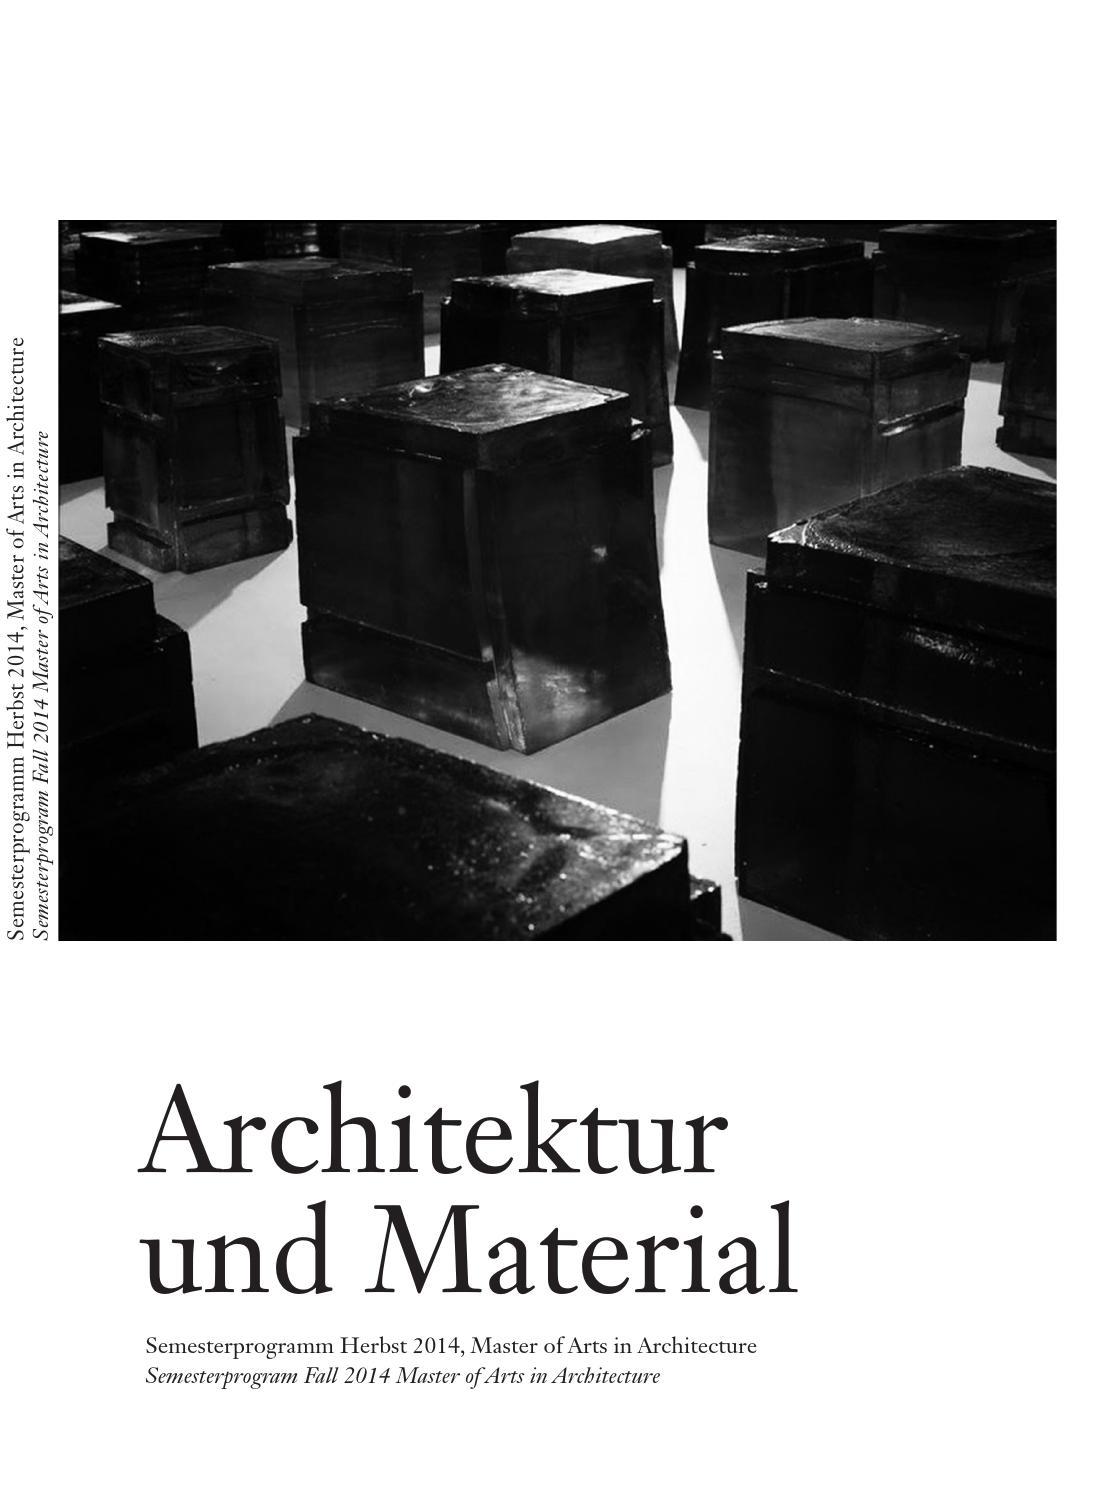 Material reader hs 14 by Master Architektur - issuu